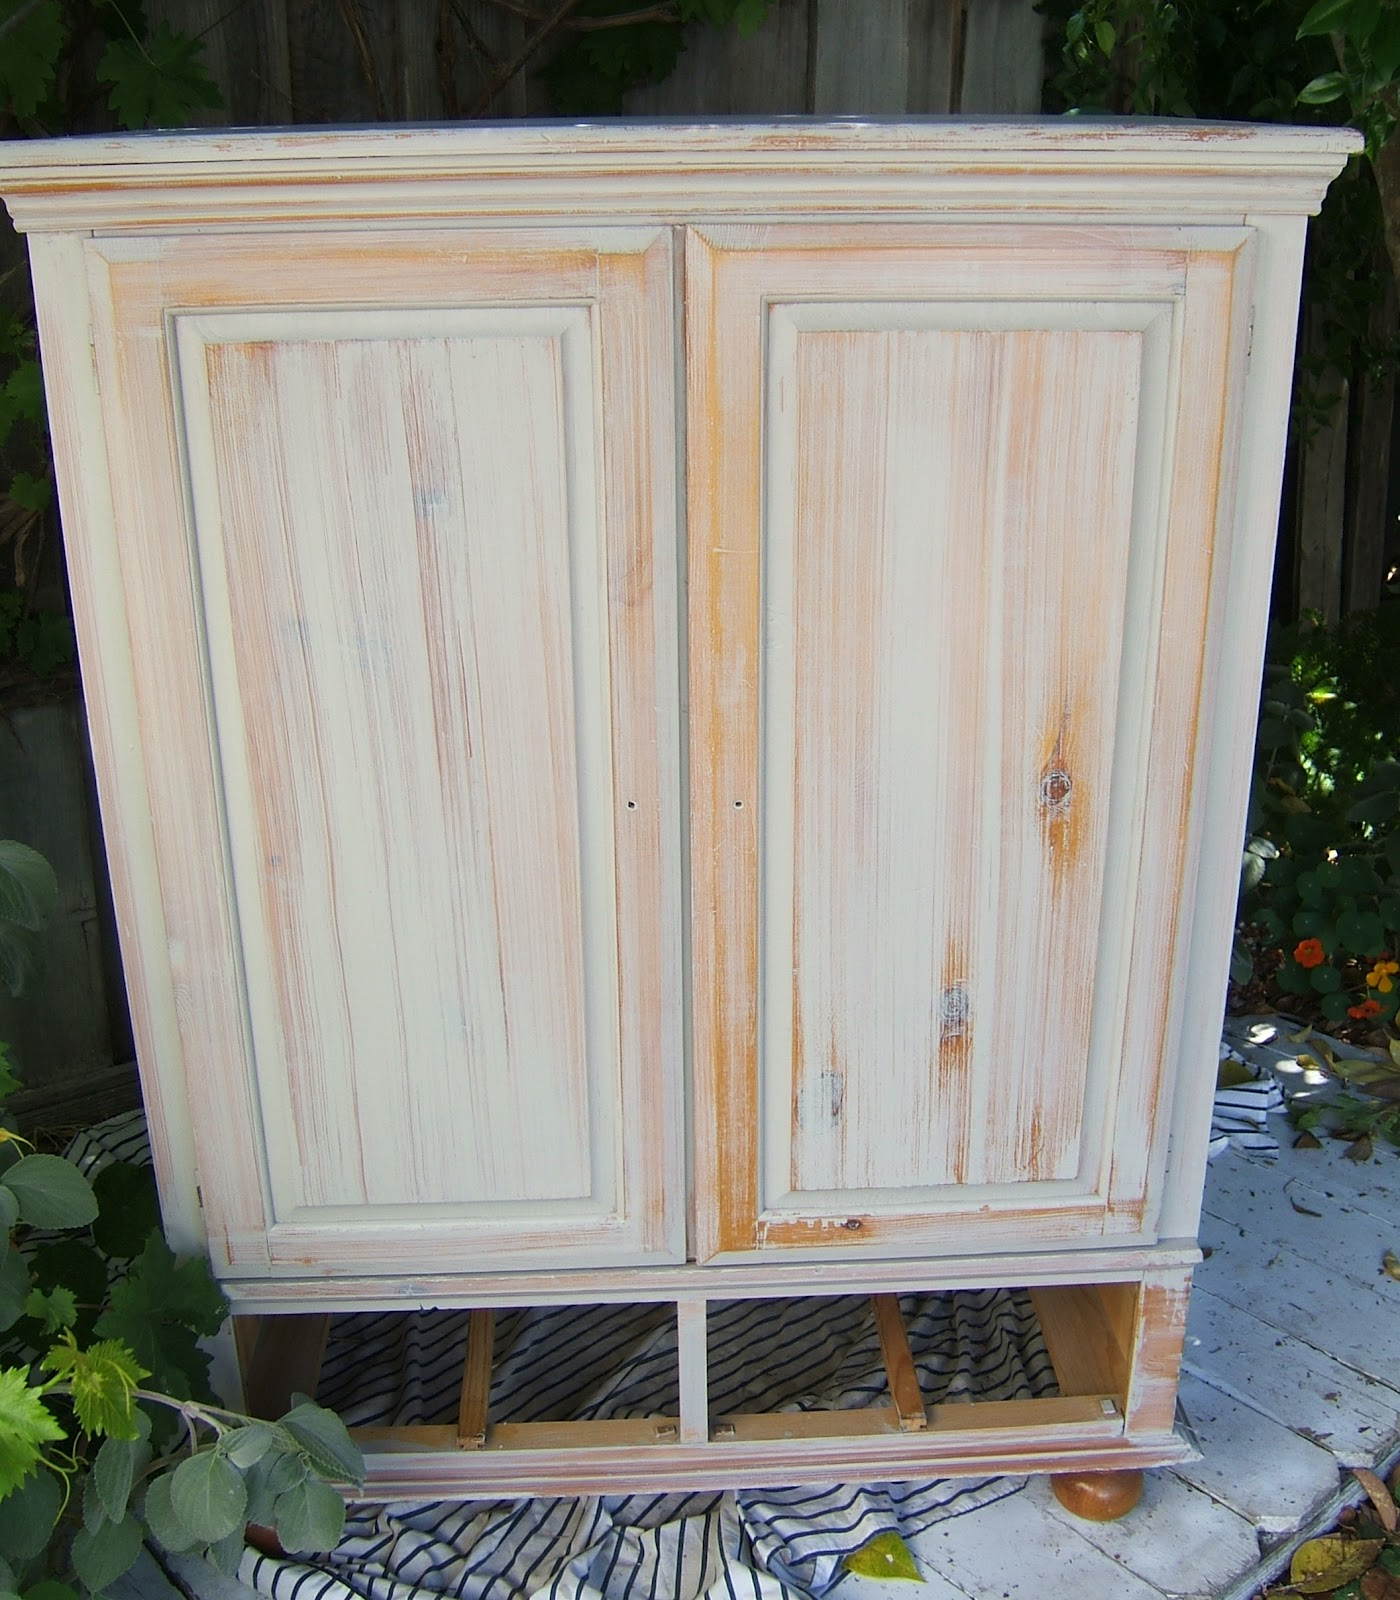 Best way to clean wood furniture - Best Way To Clean Wood Furniture 40